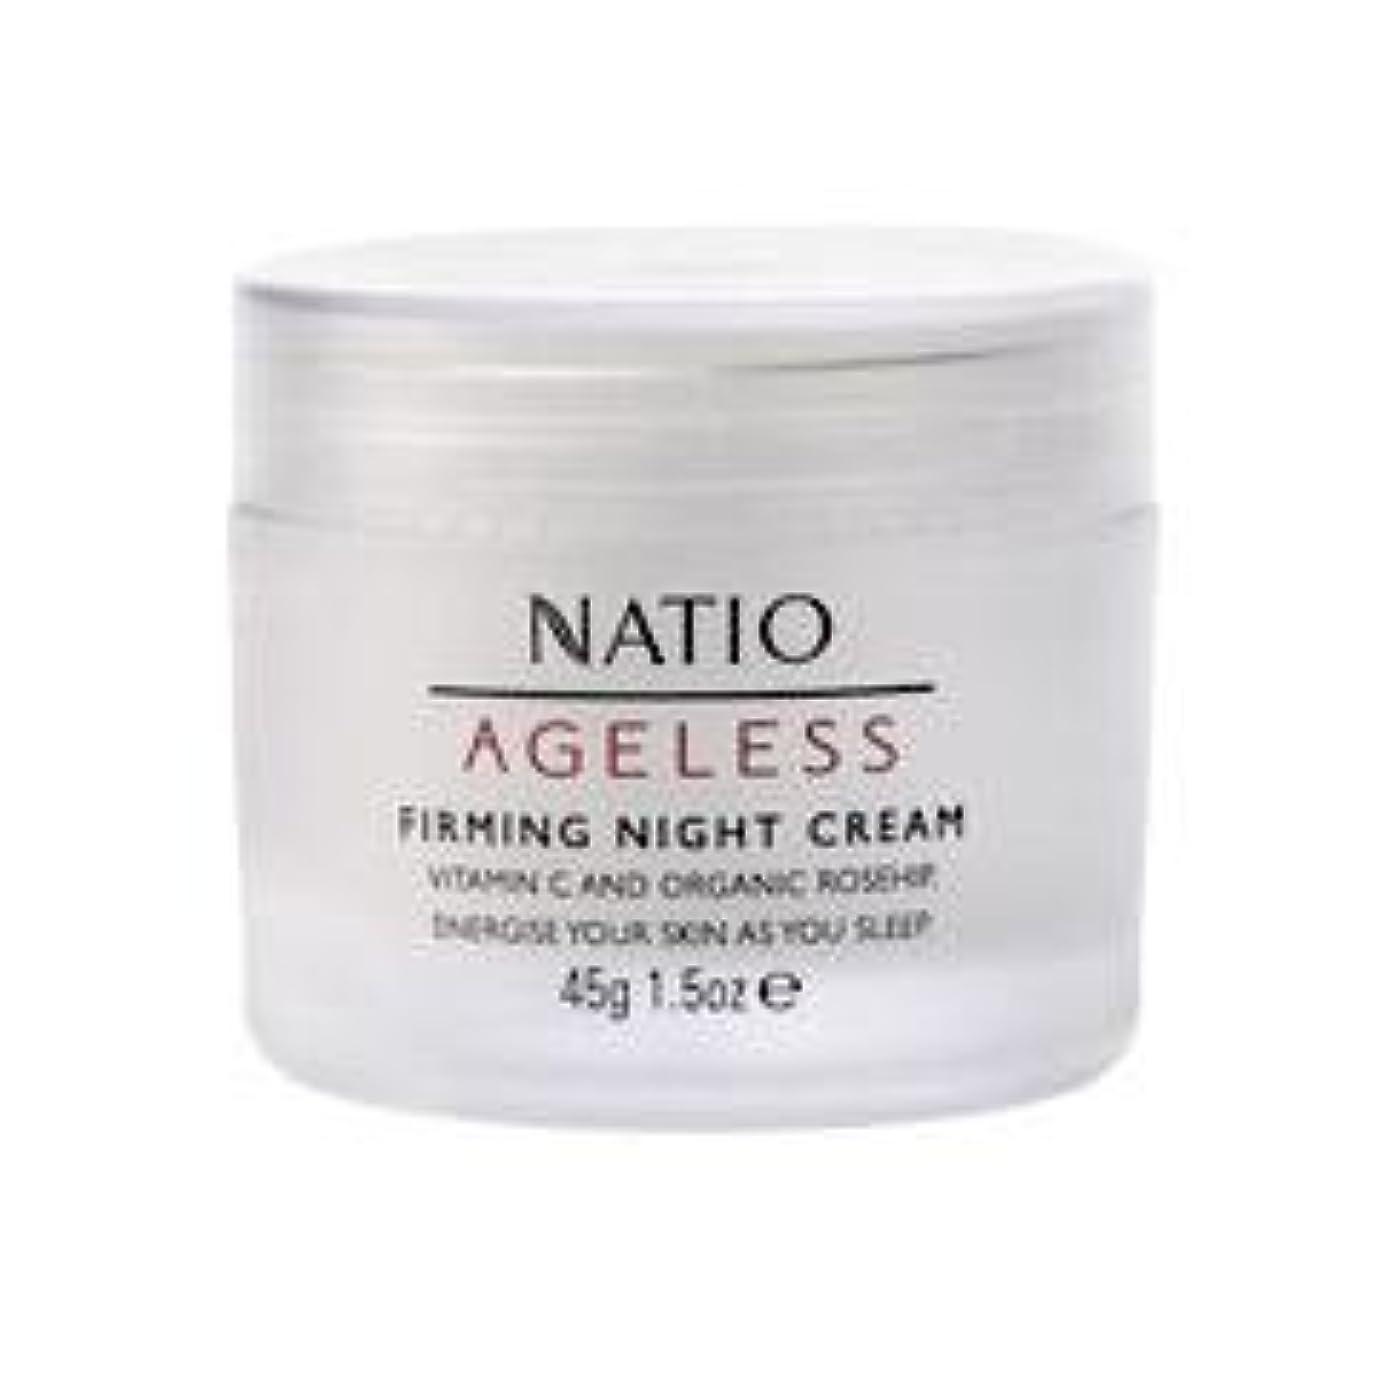 【NATIO Ageless Firming Night Cream】 ナティオ ナイトクリーム [海外直送品]